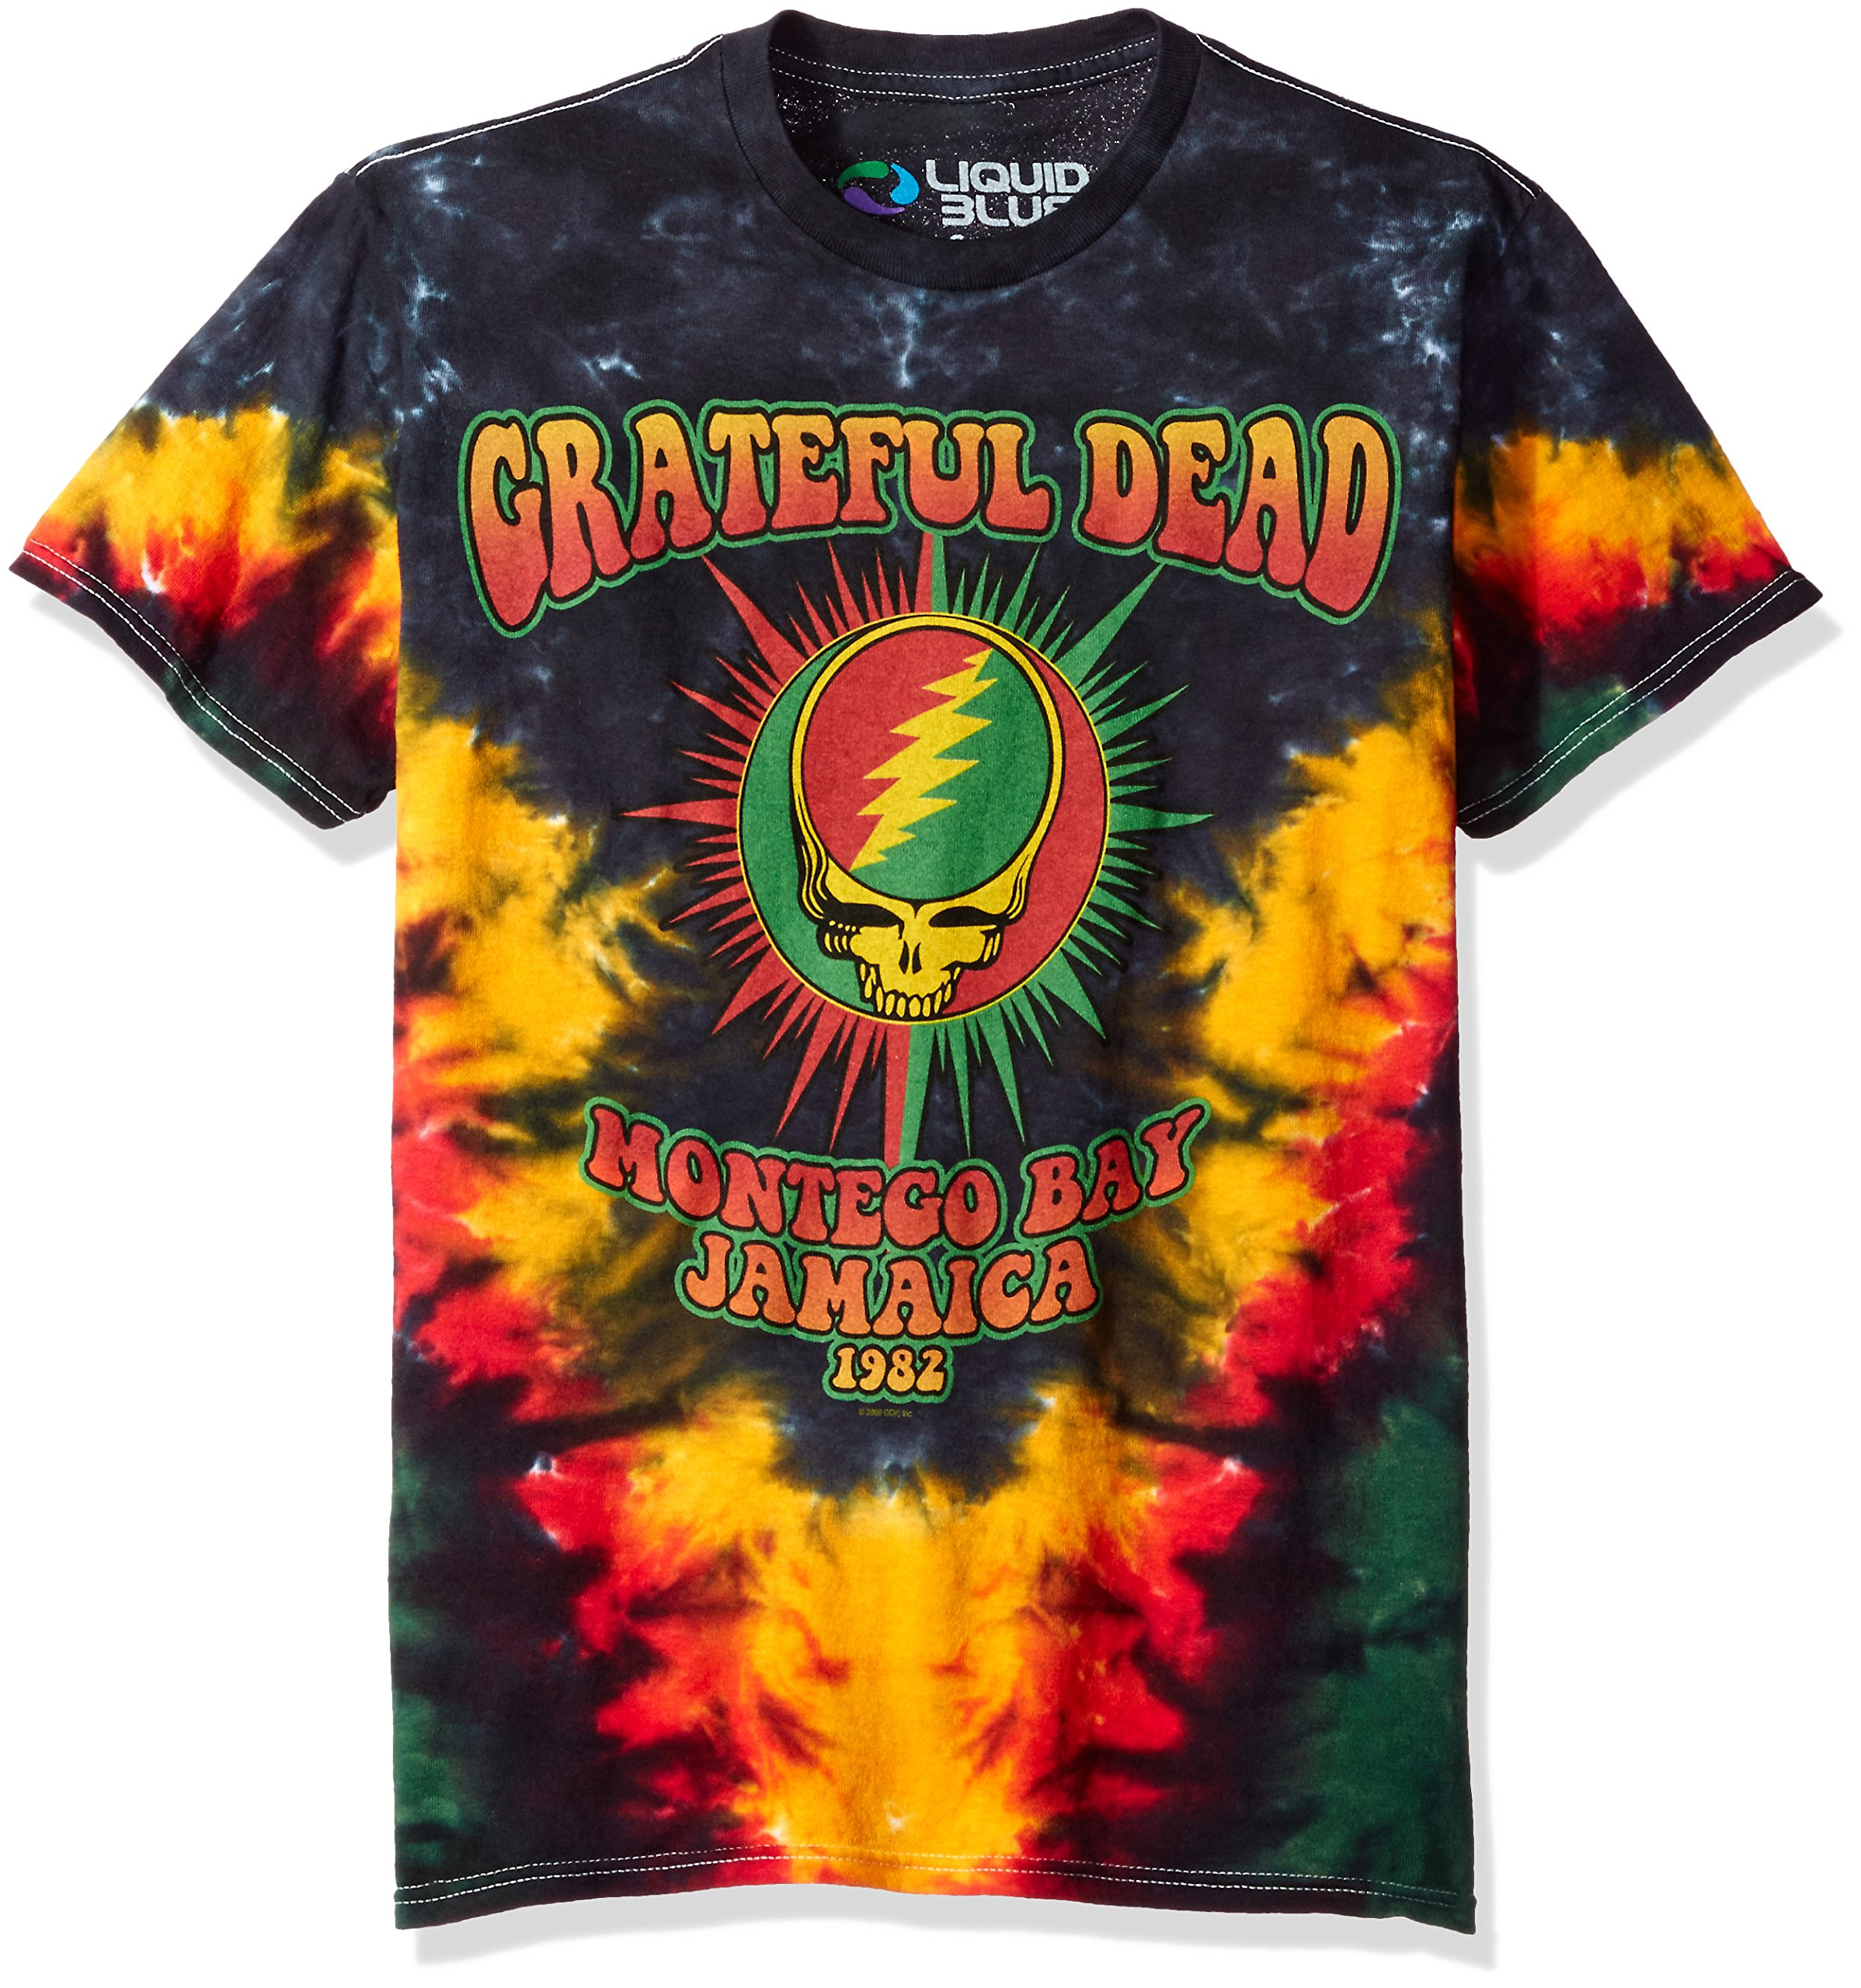 f58abad1135 Grateful Dead Spiral Bears Tie Dye T Shirt - BCD Tofu House